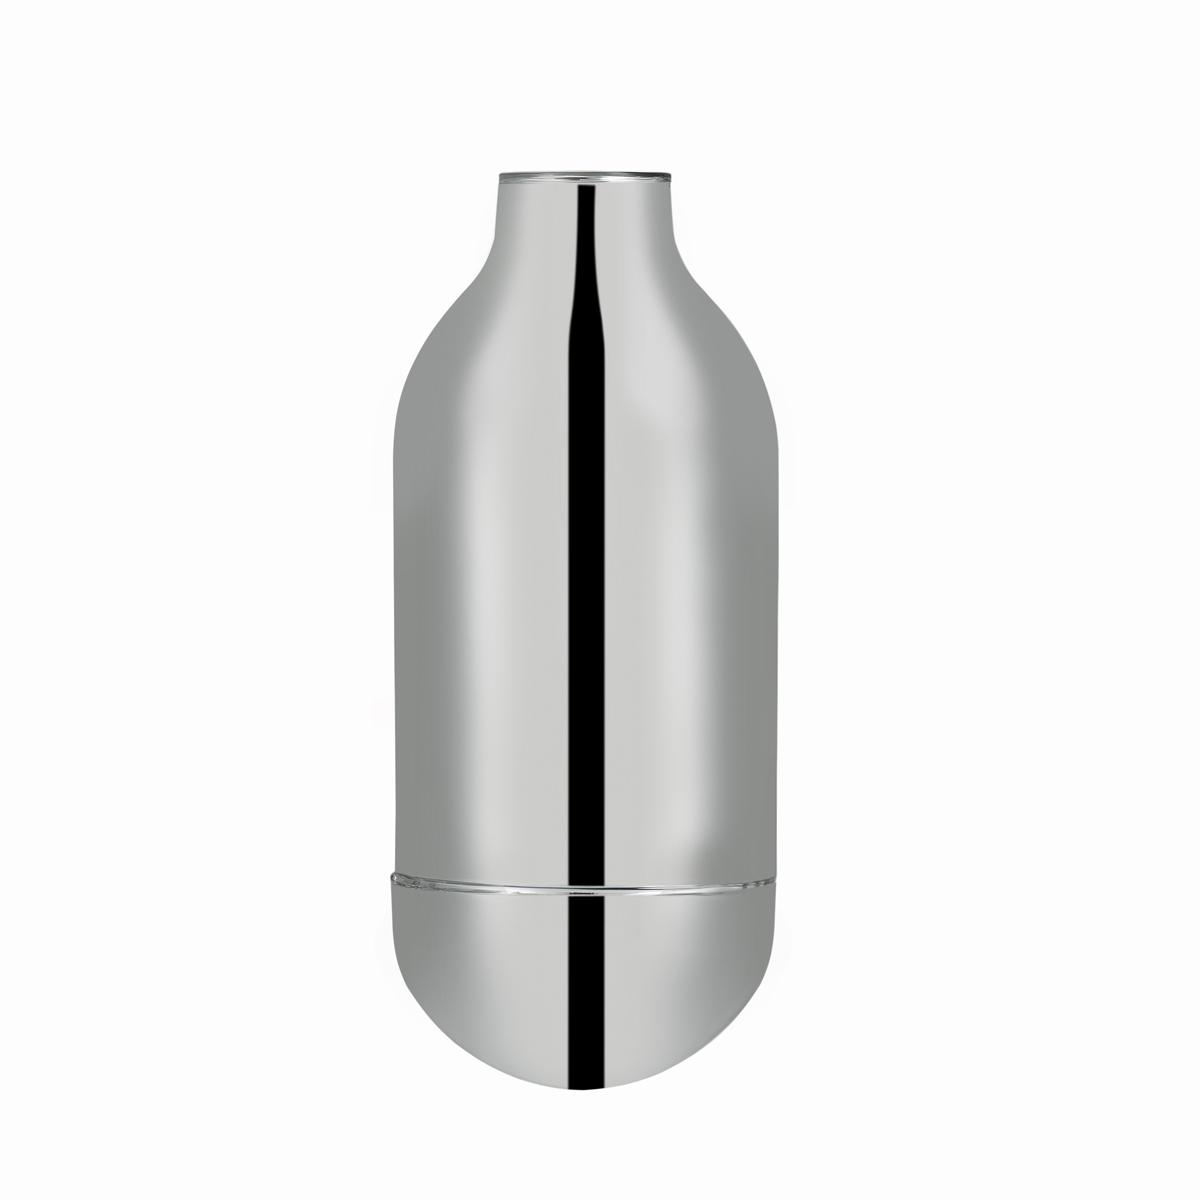 Вакуумная стеклянная колба для термоса Gipfel 8382 1,8 л